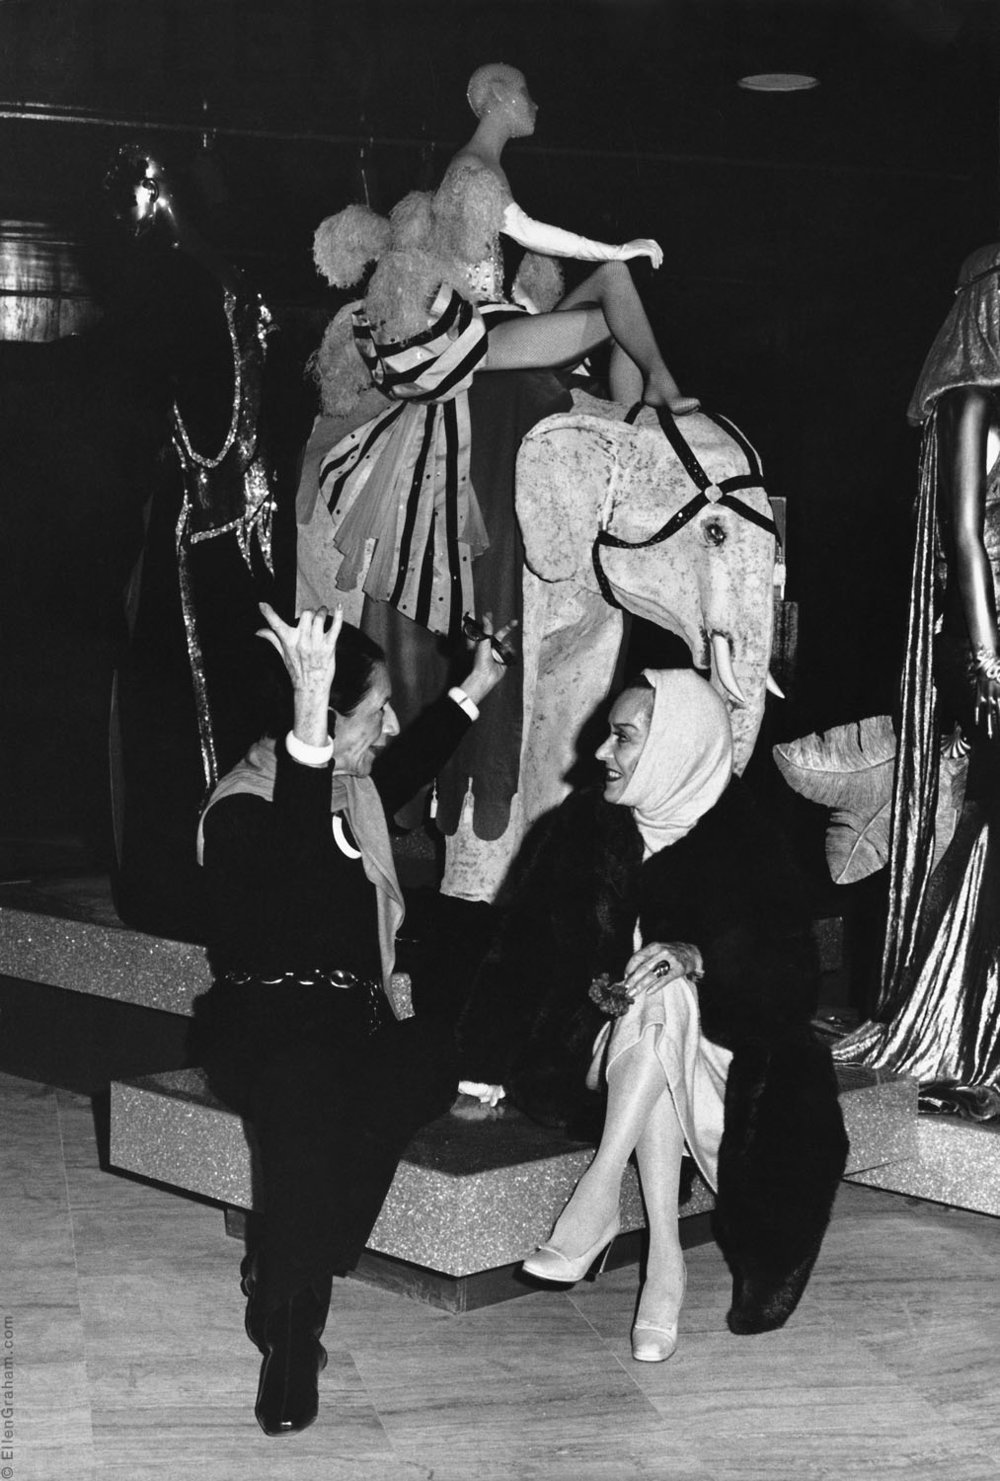 Diana Vreeland, Gloria Swanson, Costume Institute, The Metropolitan Museum of Art, New York, NY, 1975